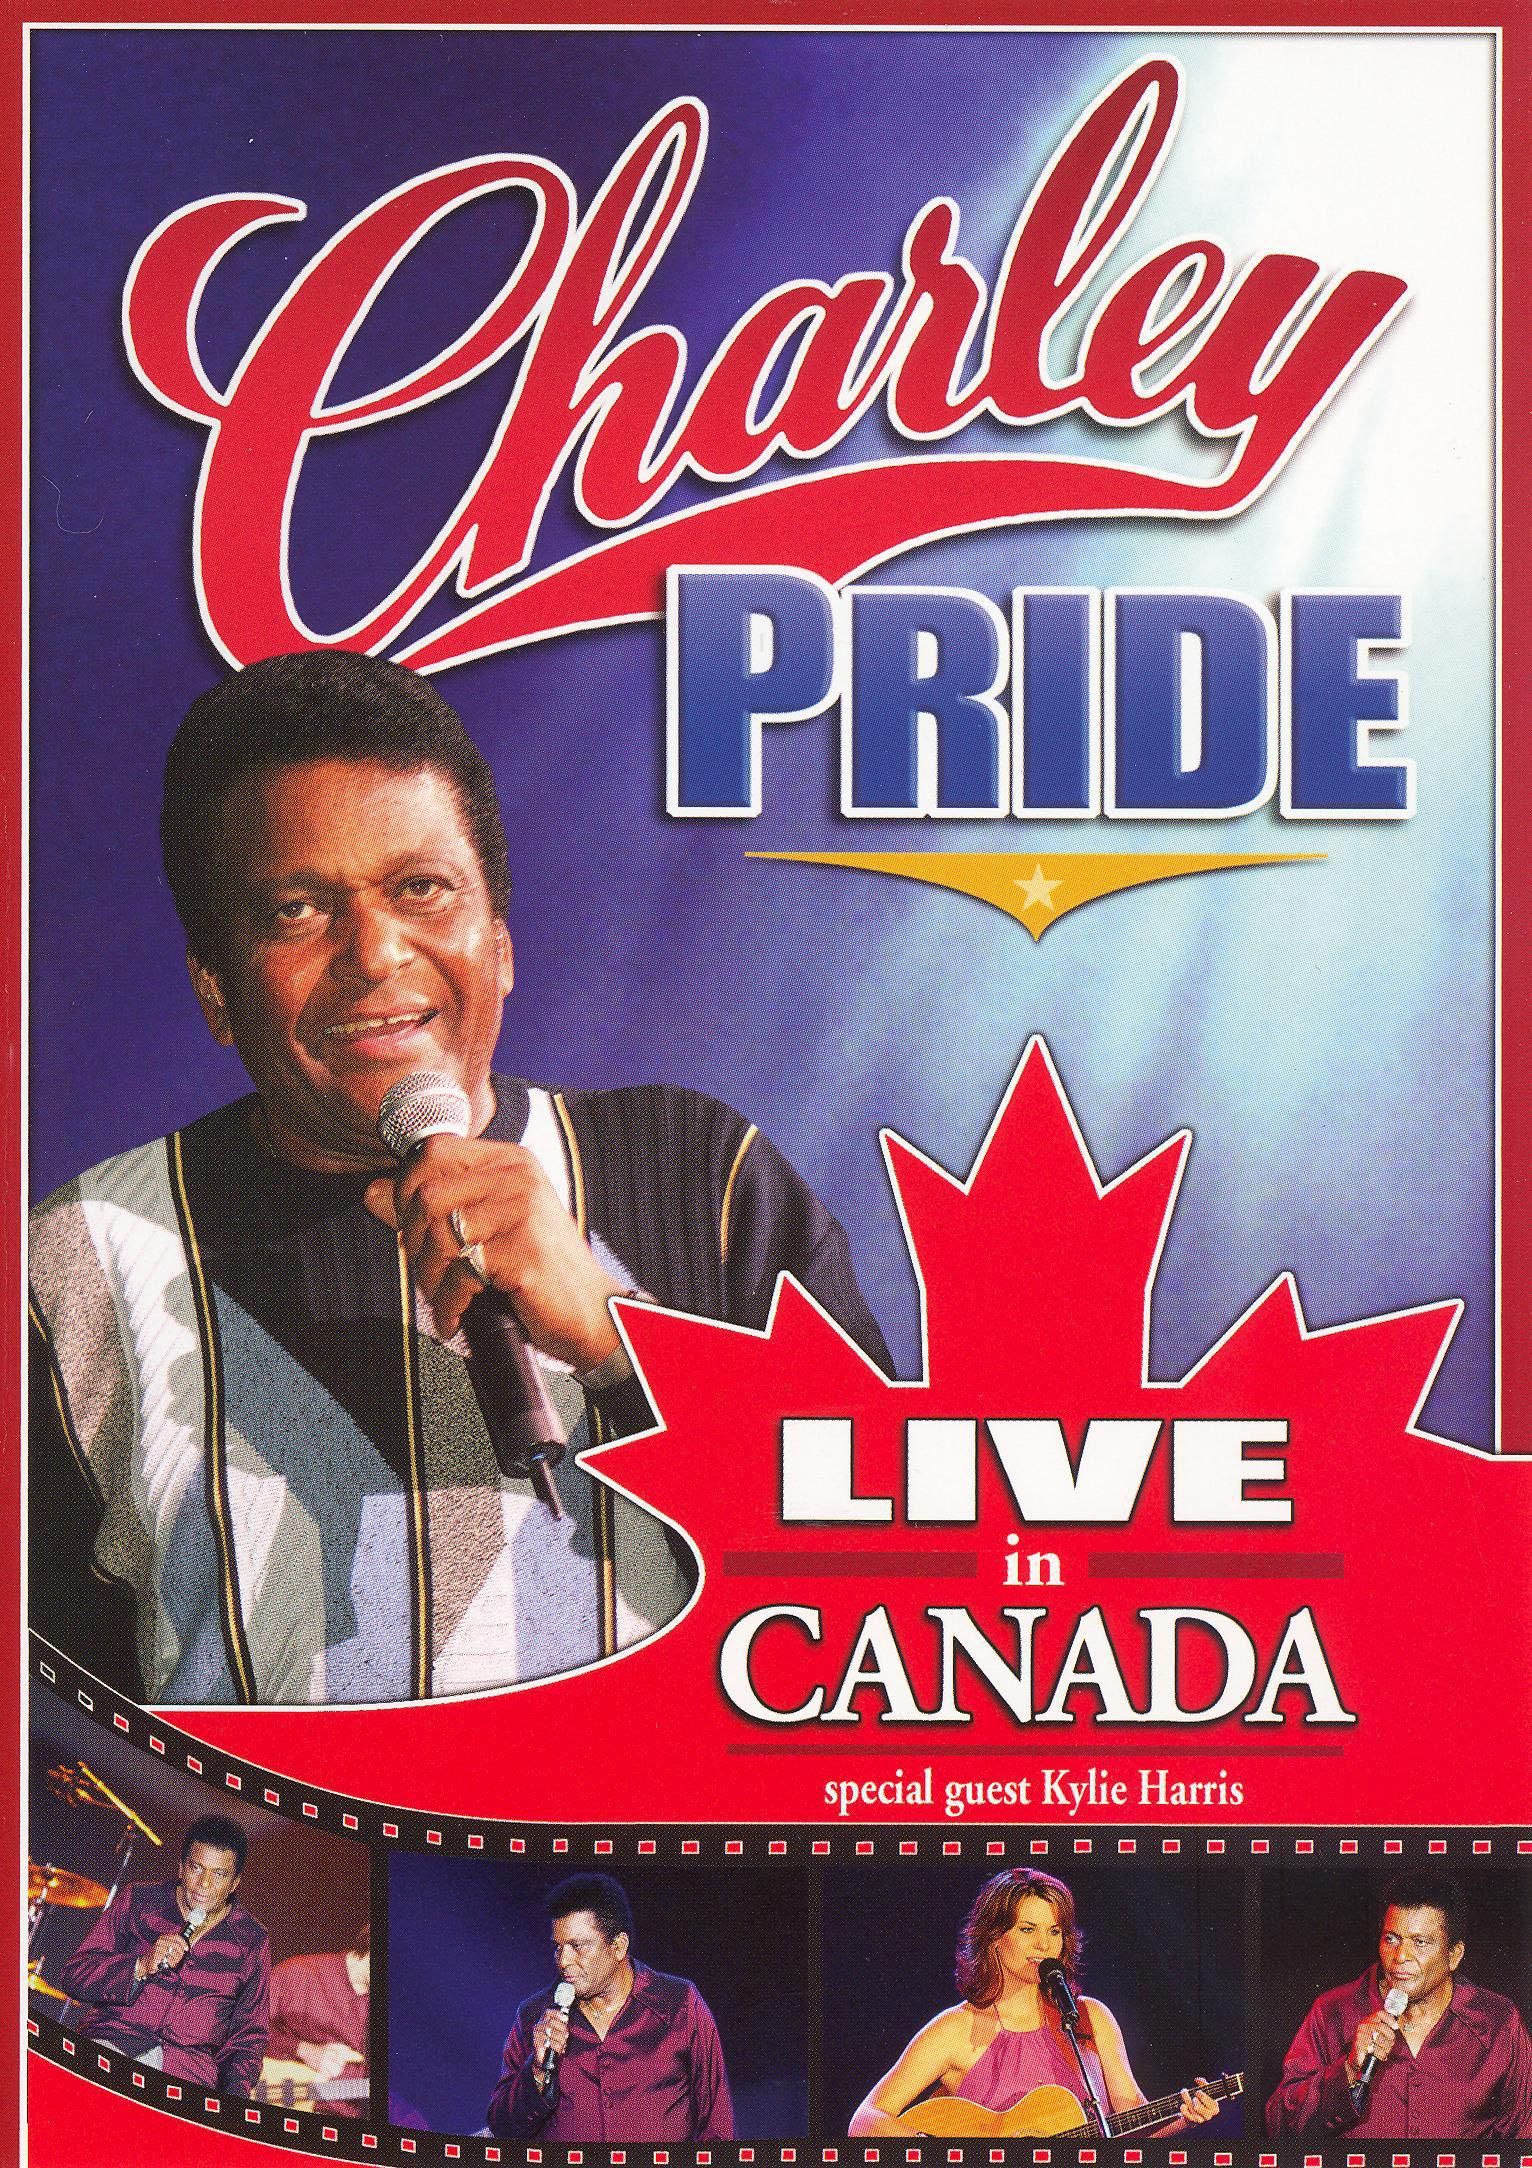 Charlie Pride Live In Canada Releases Allmovie